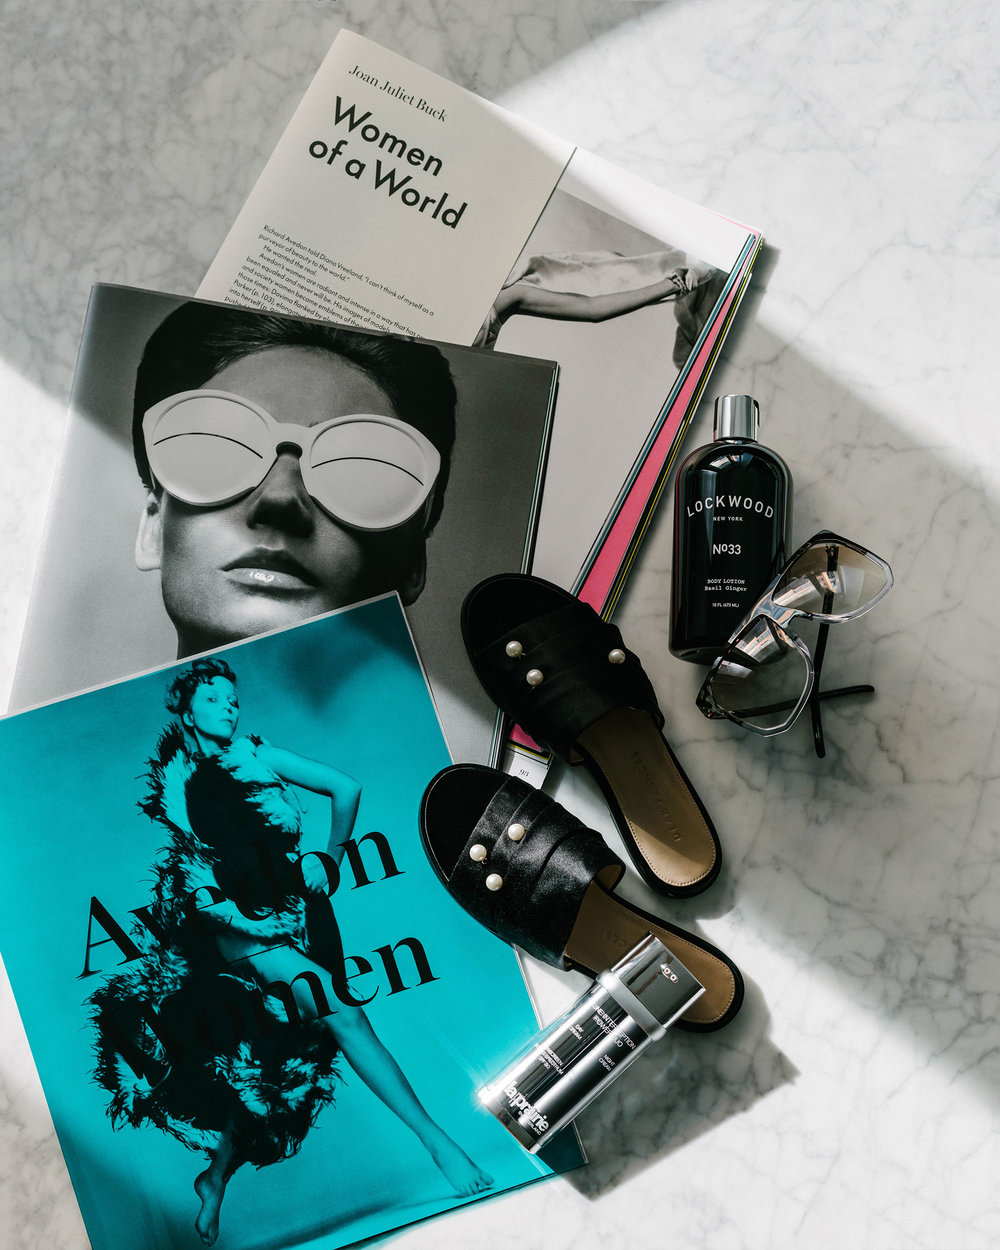 Avedon Women ,  Lockwood New York Lotion ,  Loewe Sunglasses ,  Dear Frances Sandals ,  La Prairie Cream